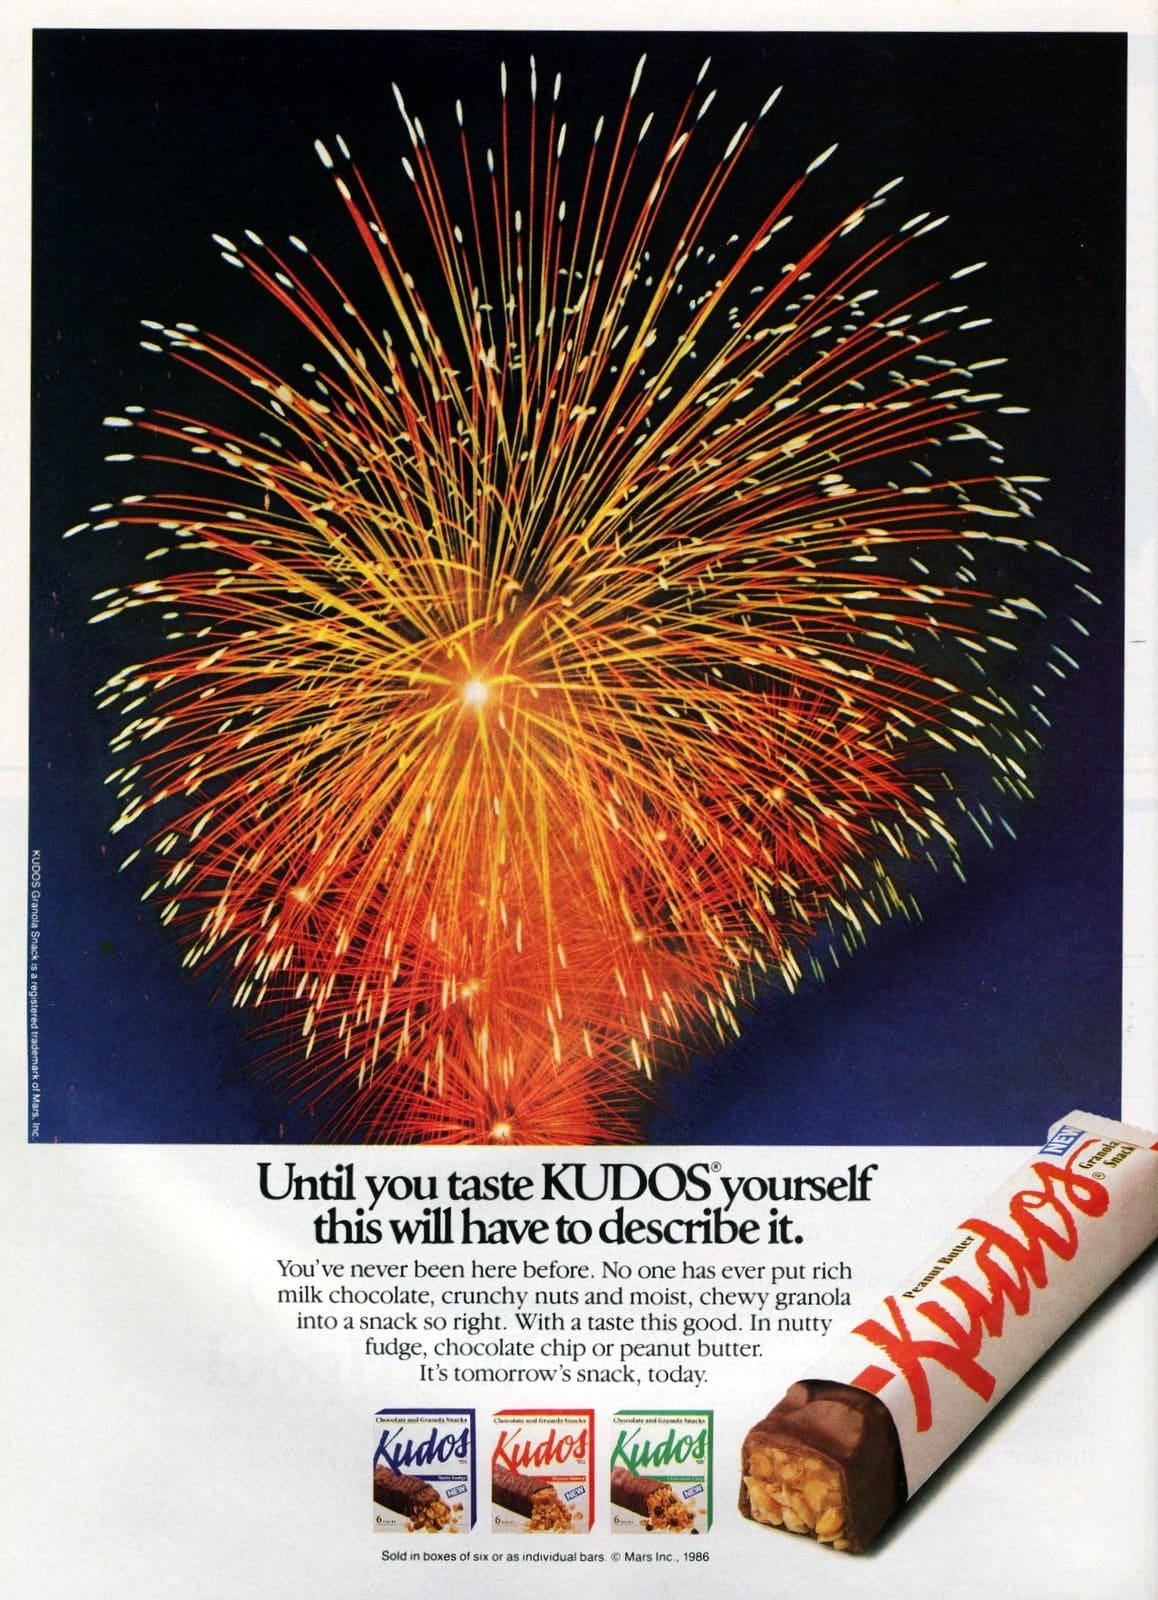 Vintage Kudos granola bars (Feb 1987)